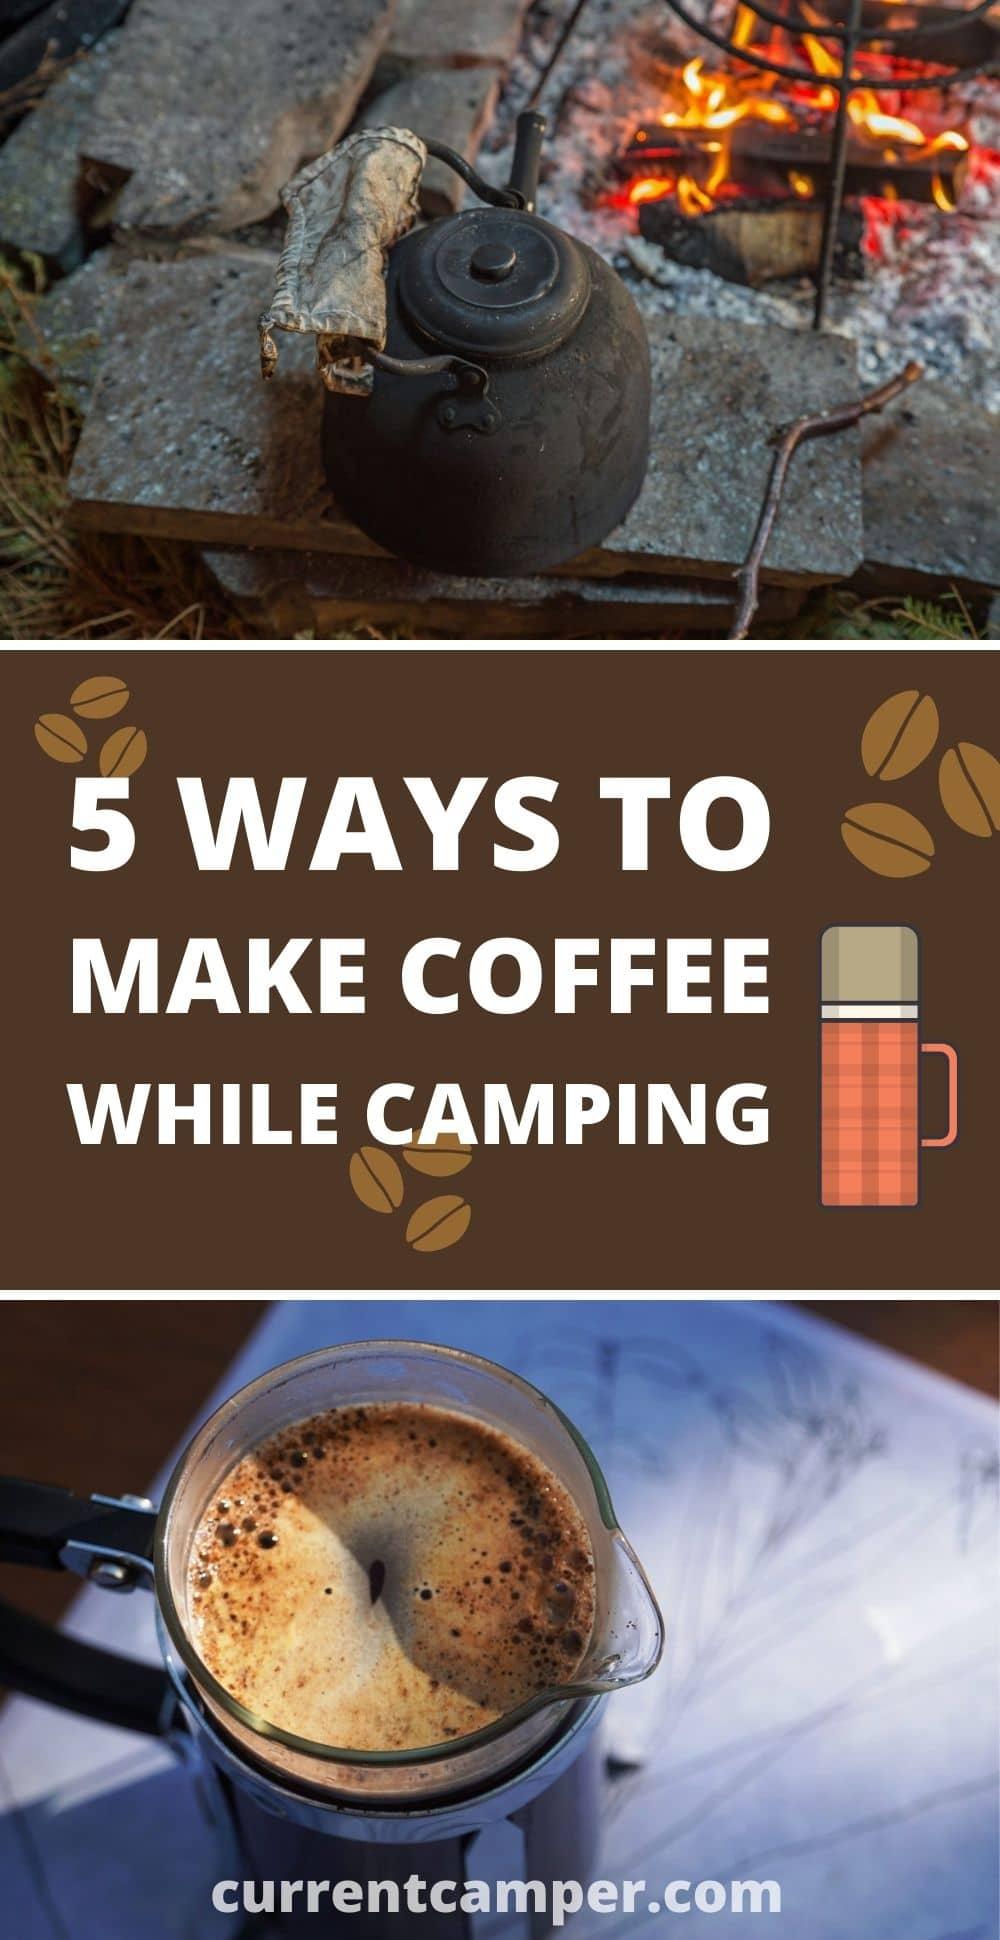 5 ways to make coffee while camping